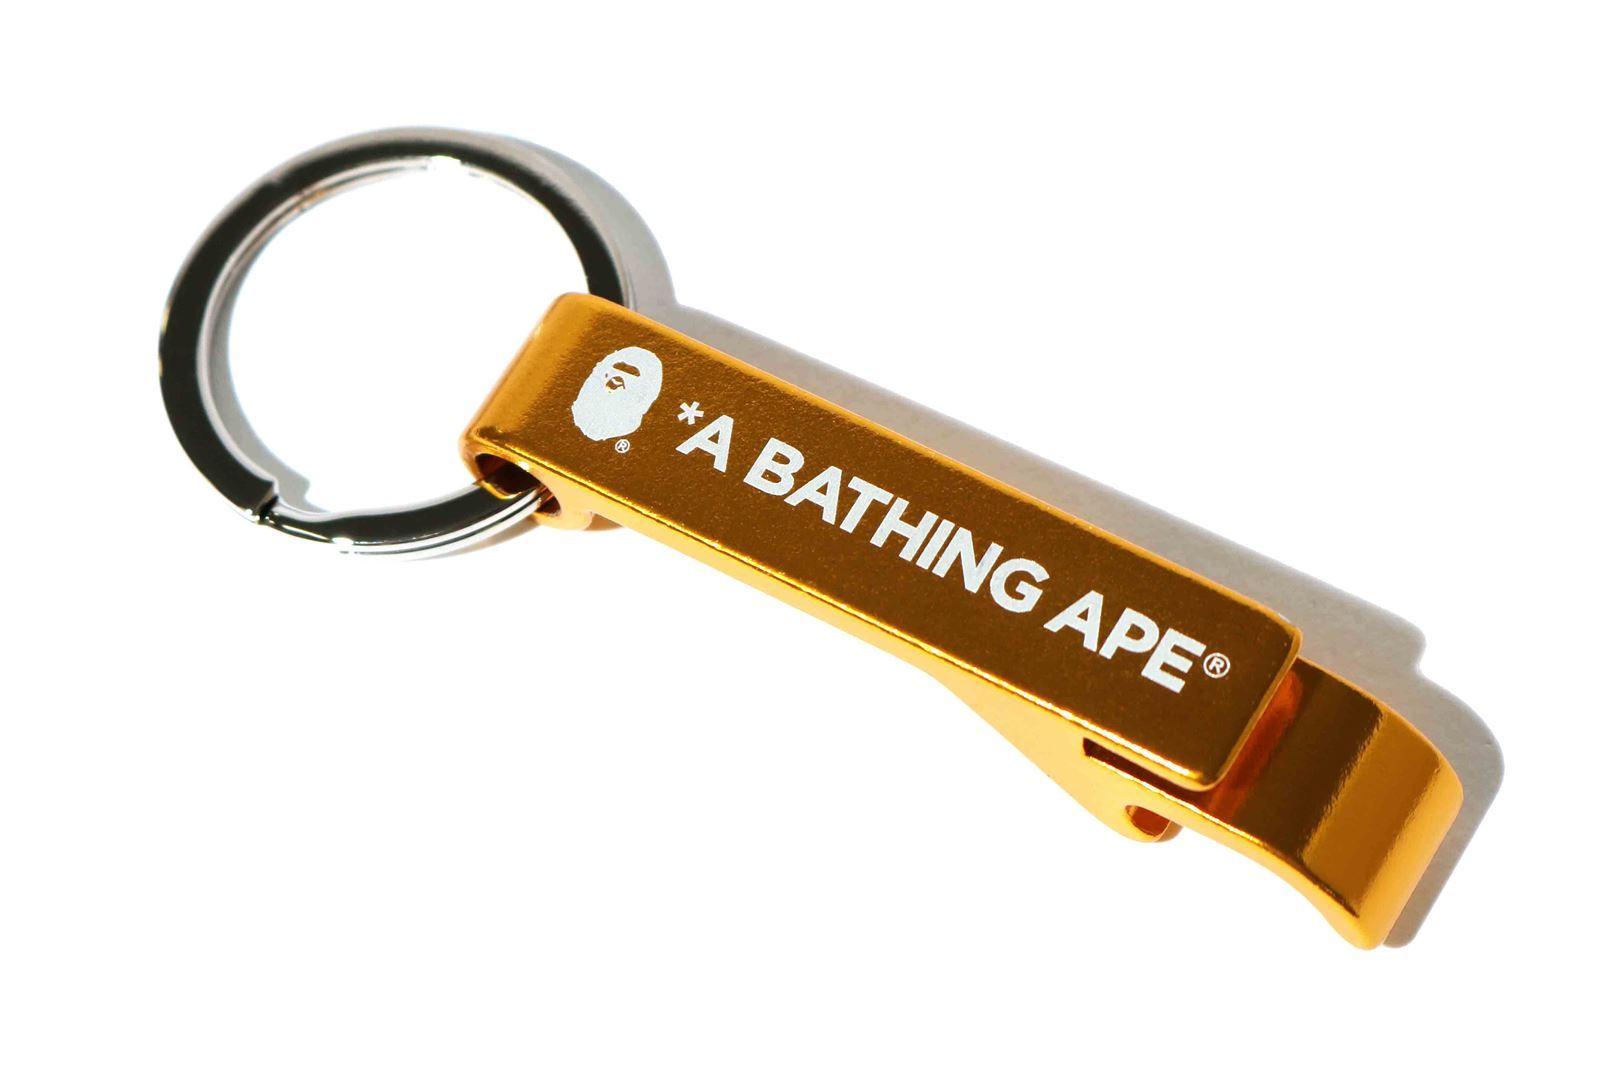 BAPE® BOTTLE OPENER KEYCHAIN_a0174495_16045979.jpg